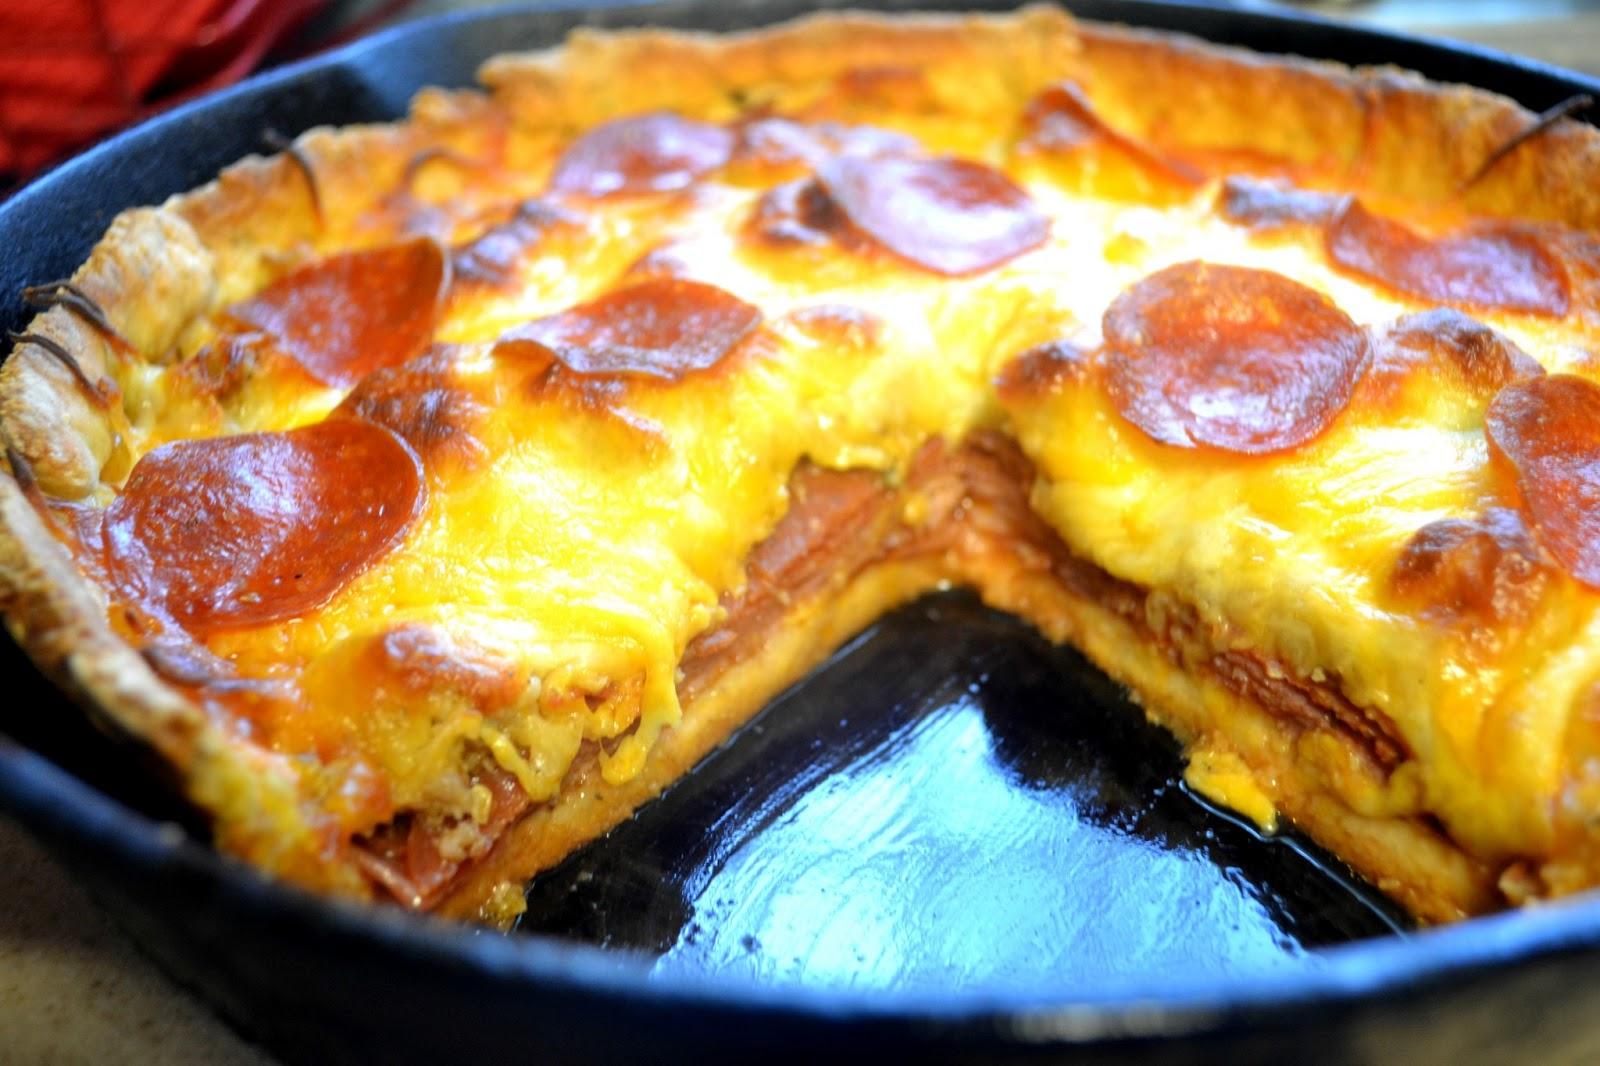 Tip garden skillet meal pizza pie